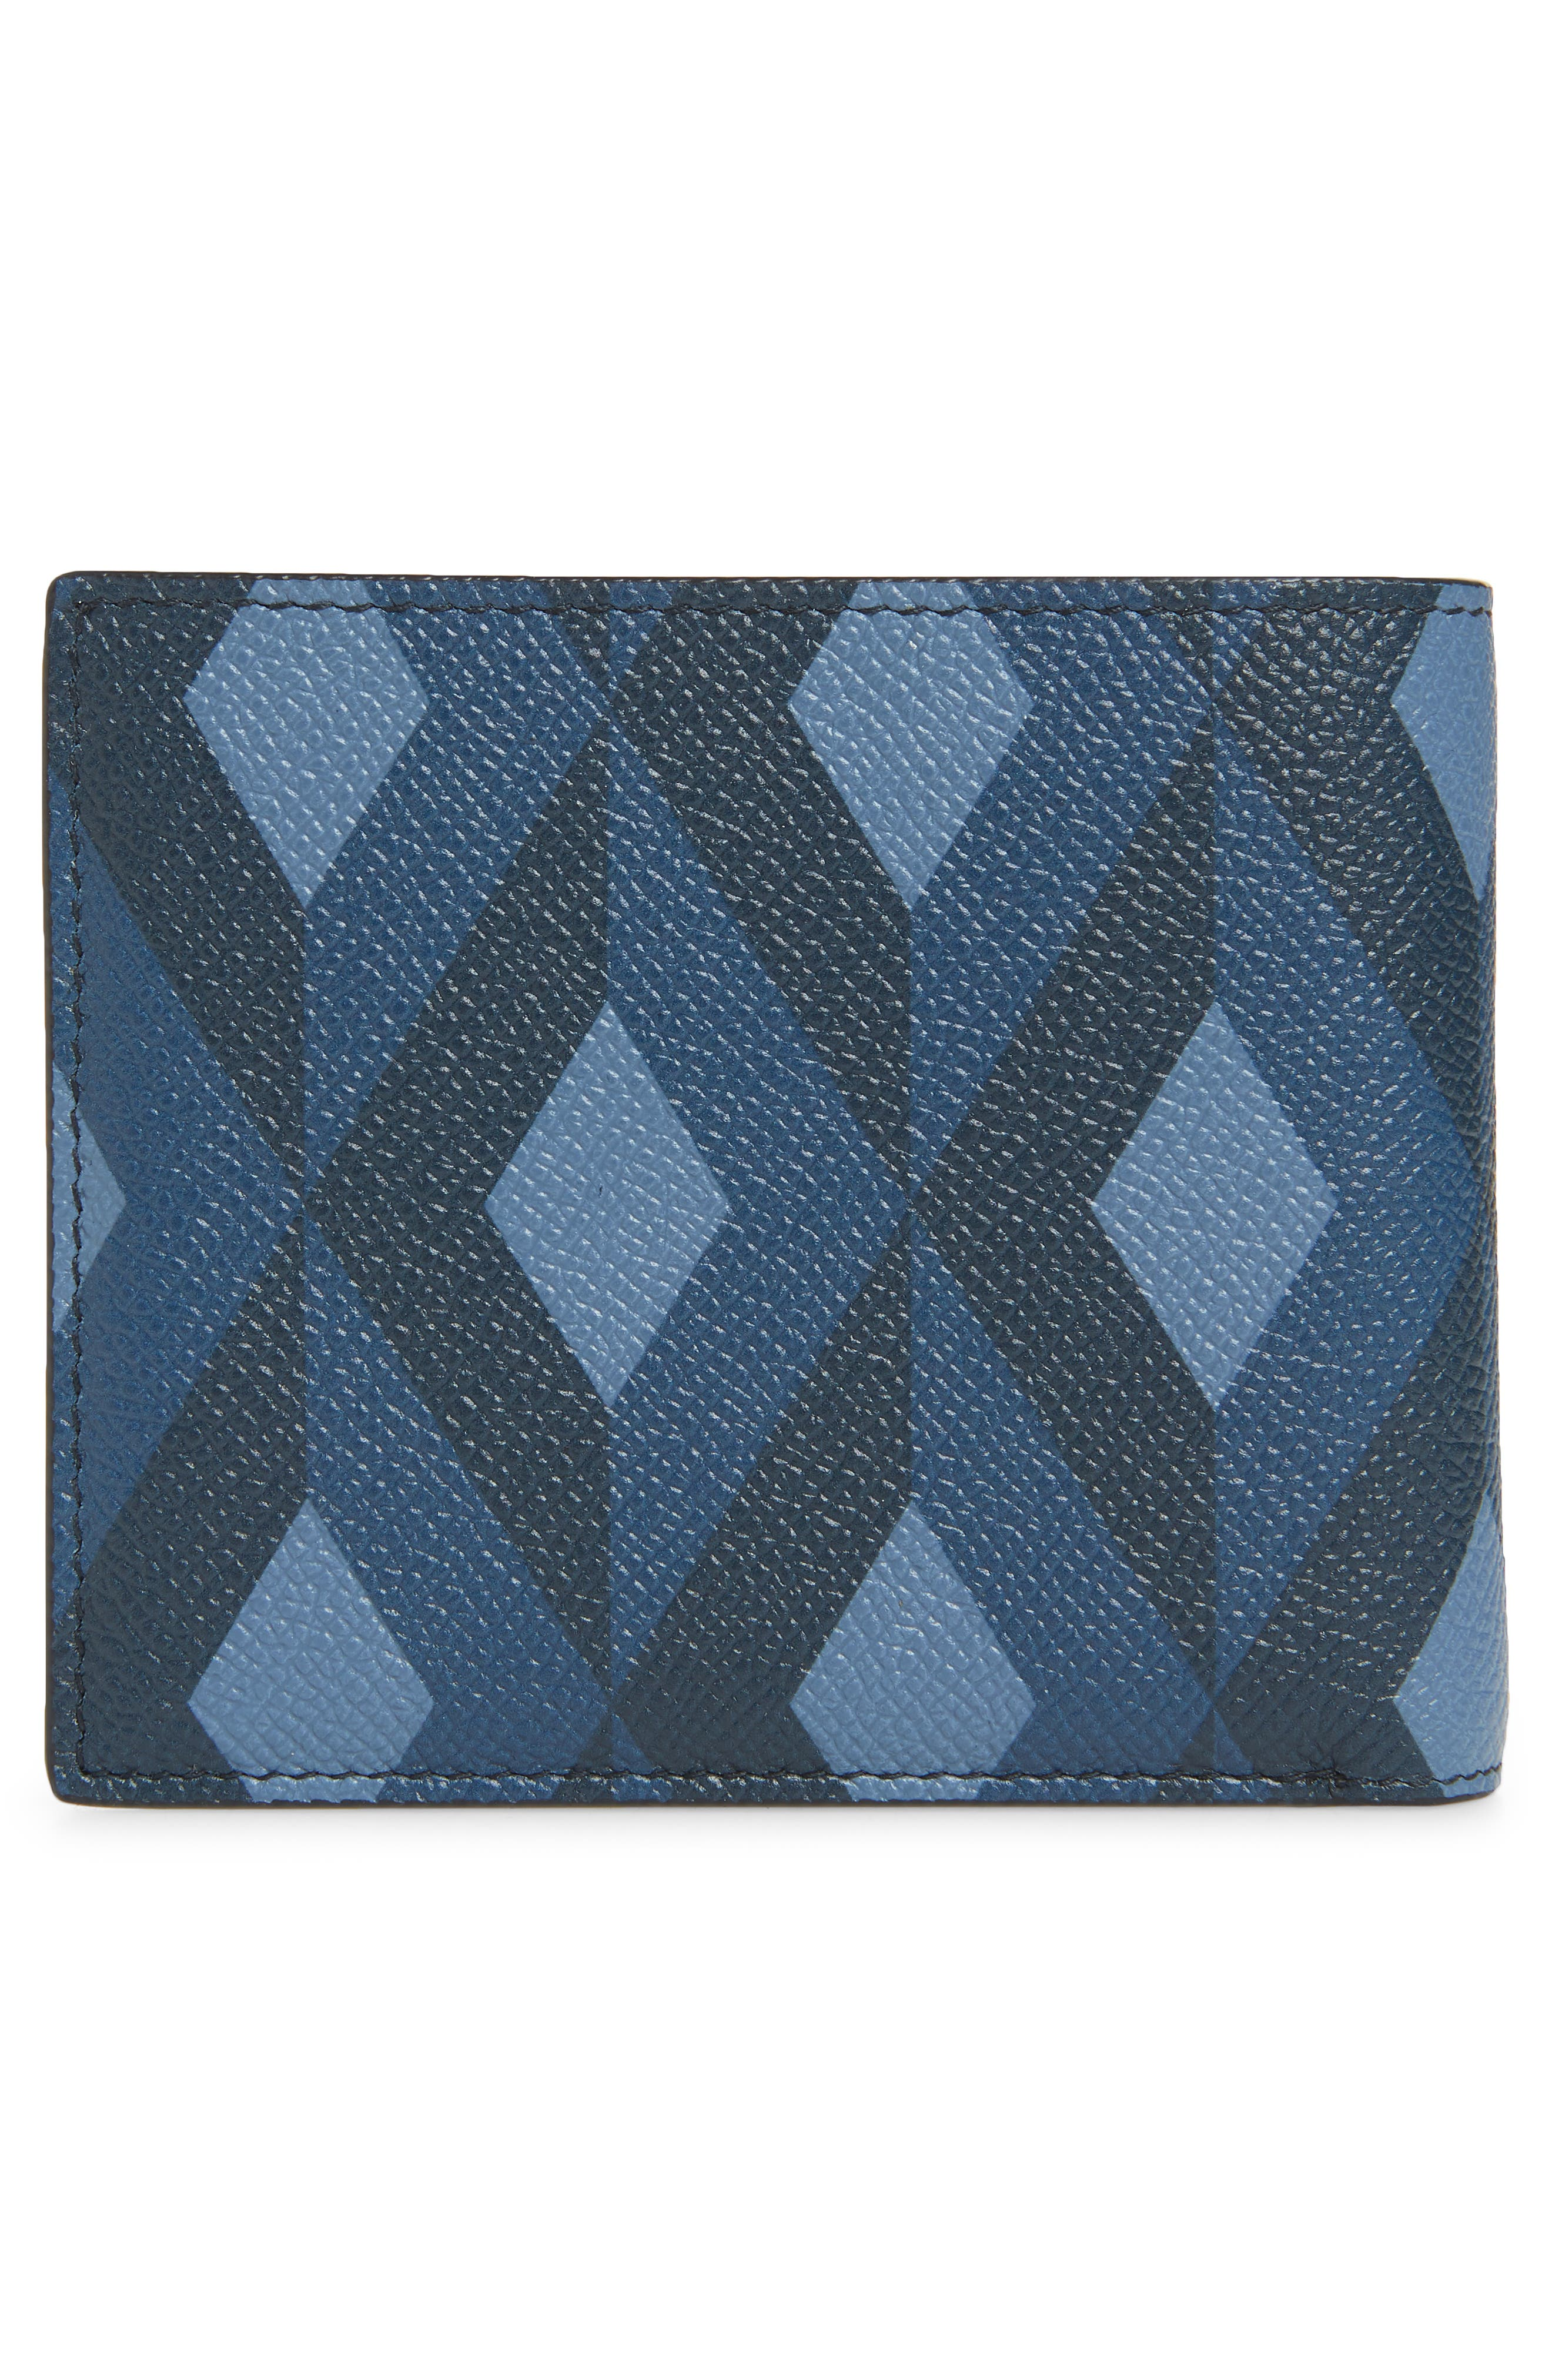 Cadogan Leather Wallet,                             Alternate thumbnail 3, color,                             BLUE